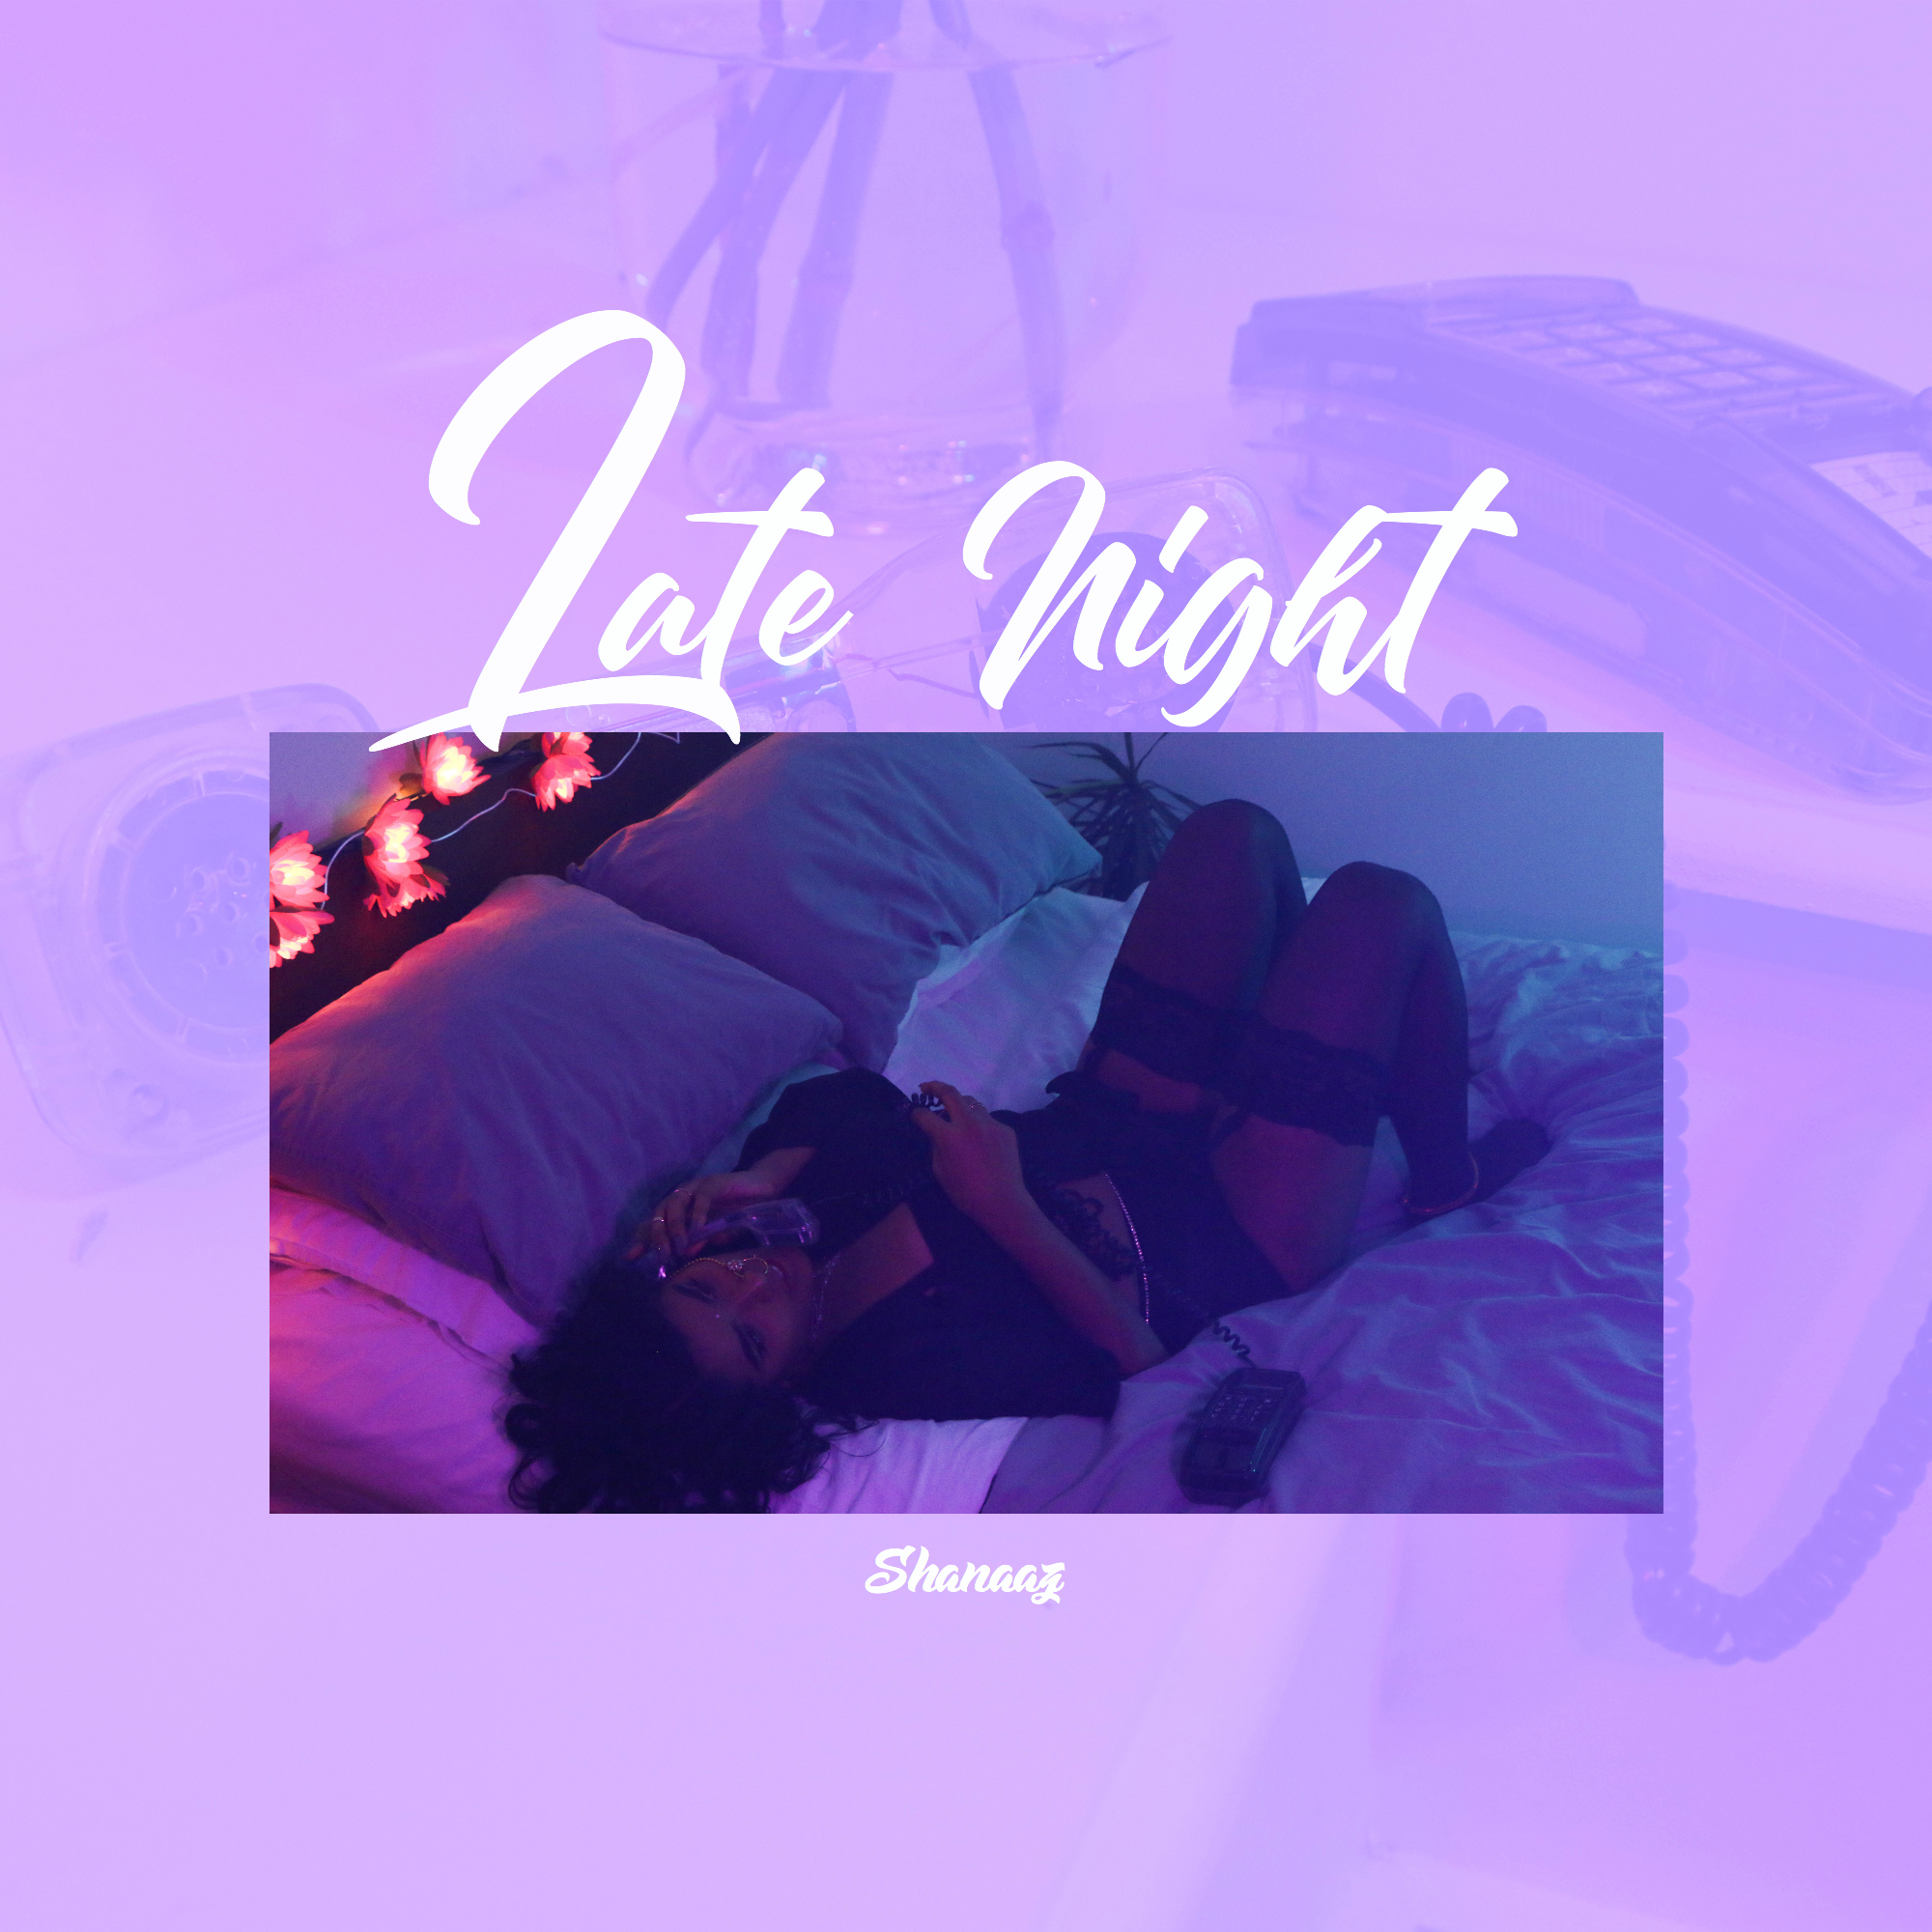 late night cover .jpg